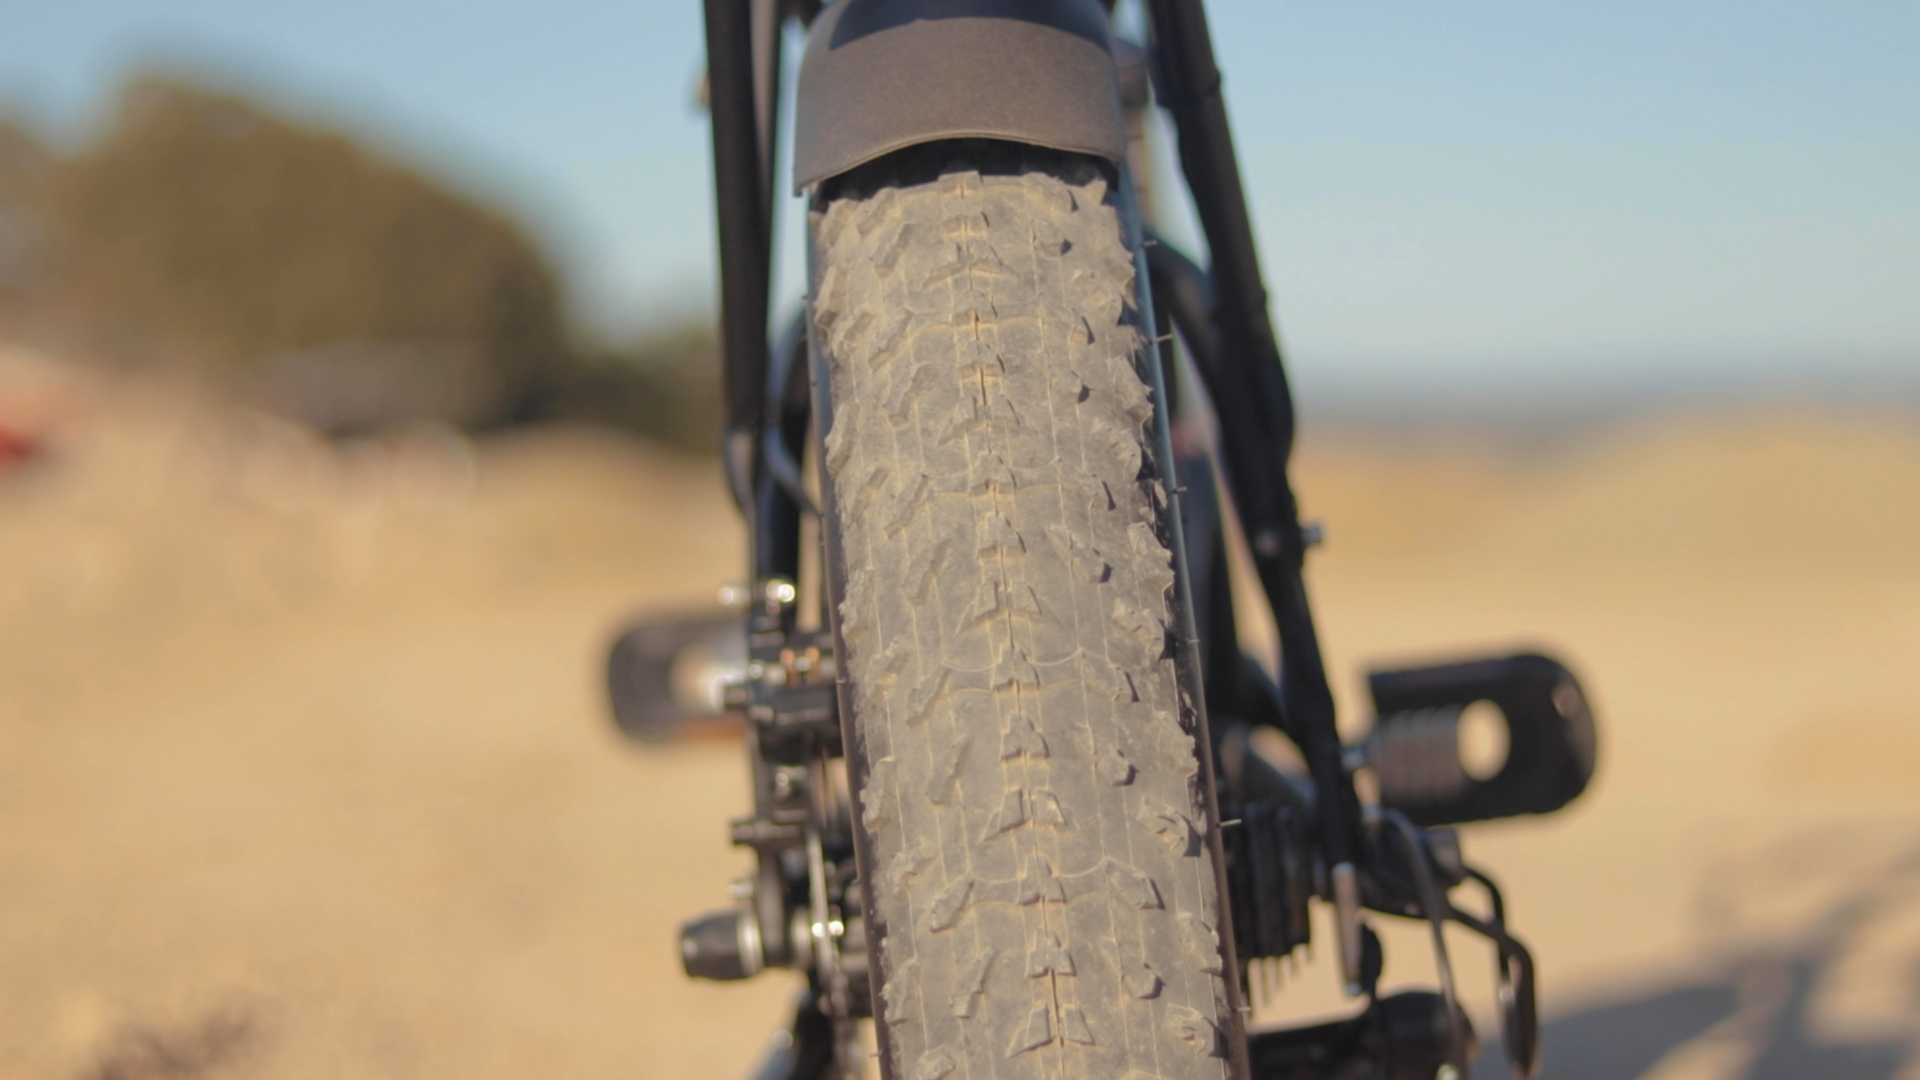 electrified-reviews-bagibike-b20-premium-electric-bike-review-tire.jpg